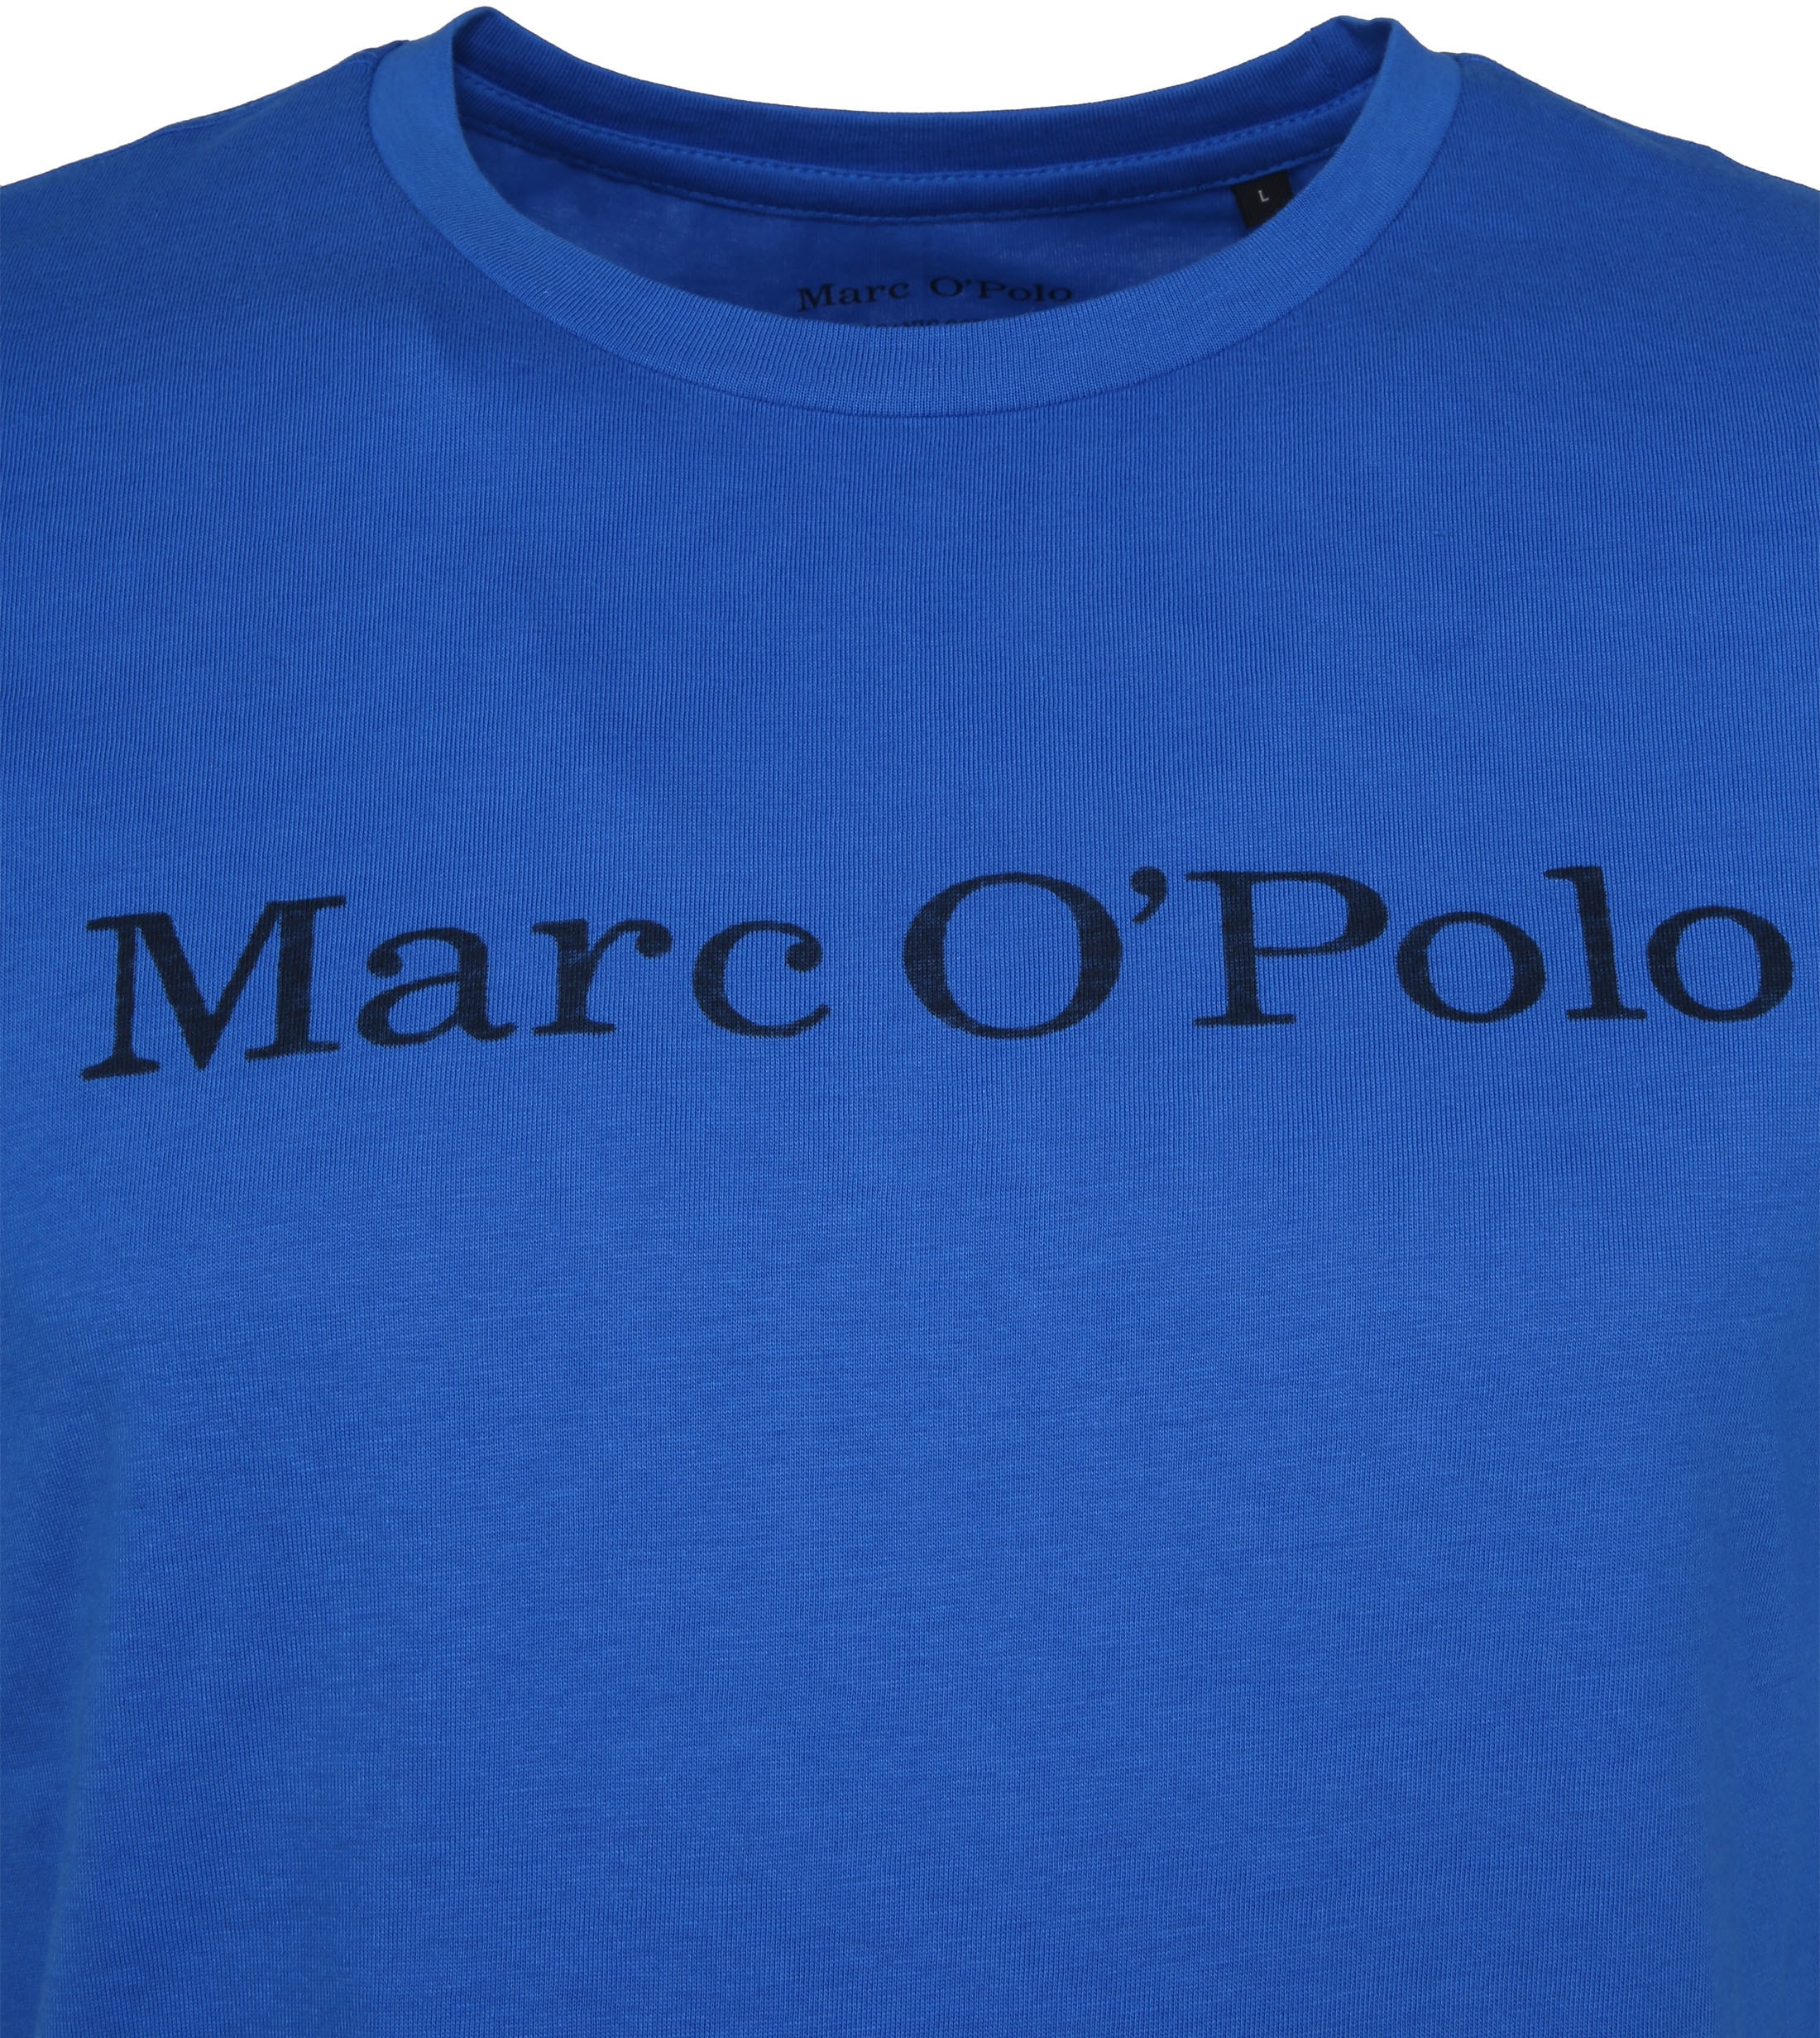 Marc O'Polo T-Shirt Victoria Blue foto 1